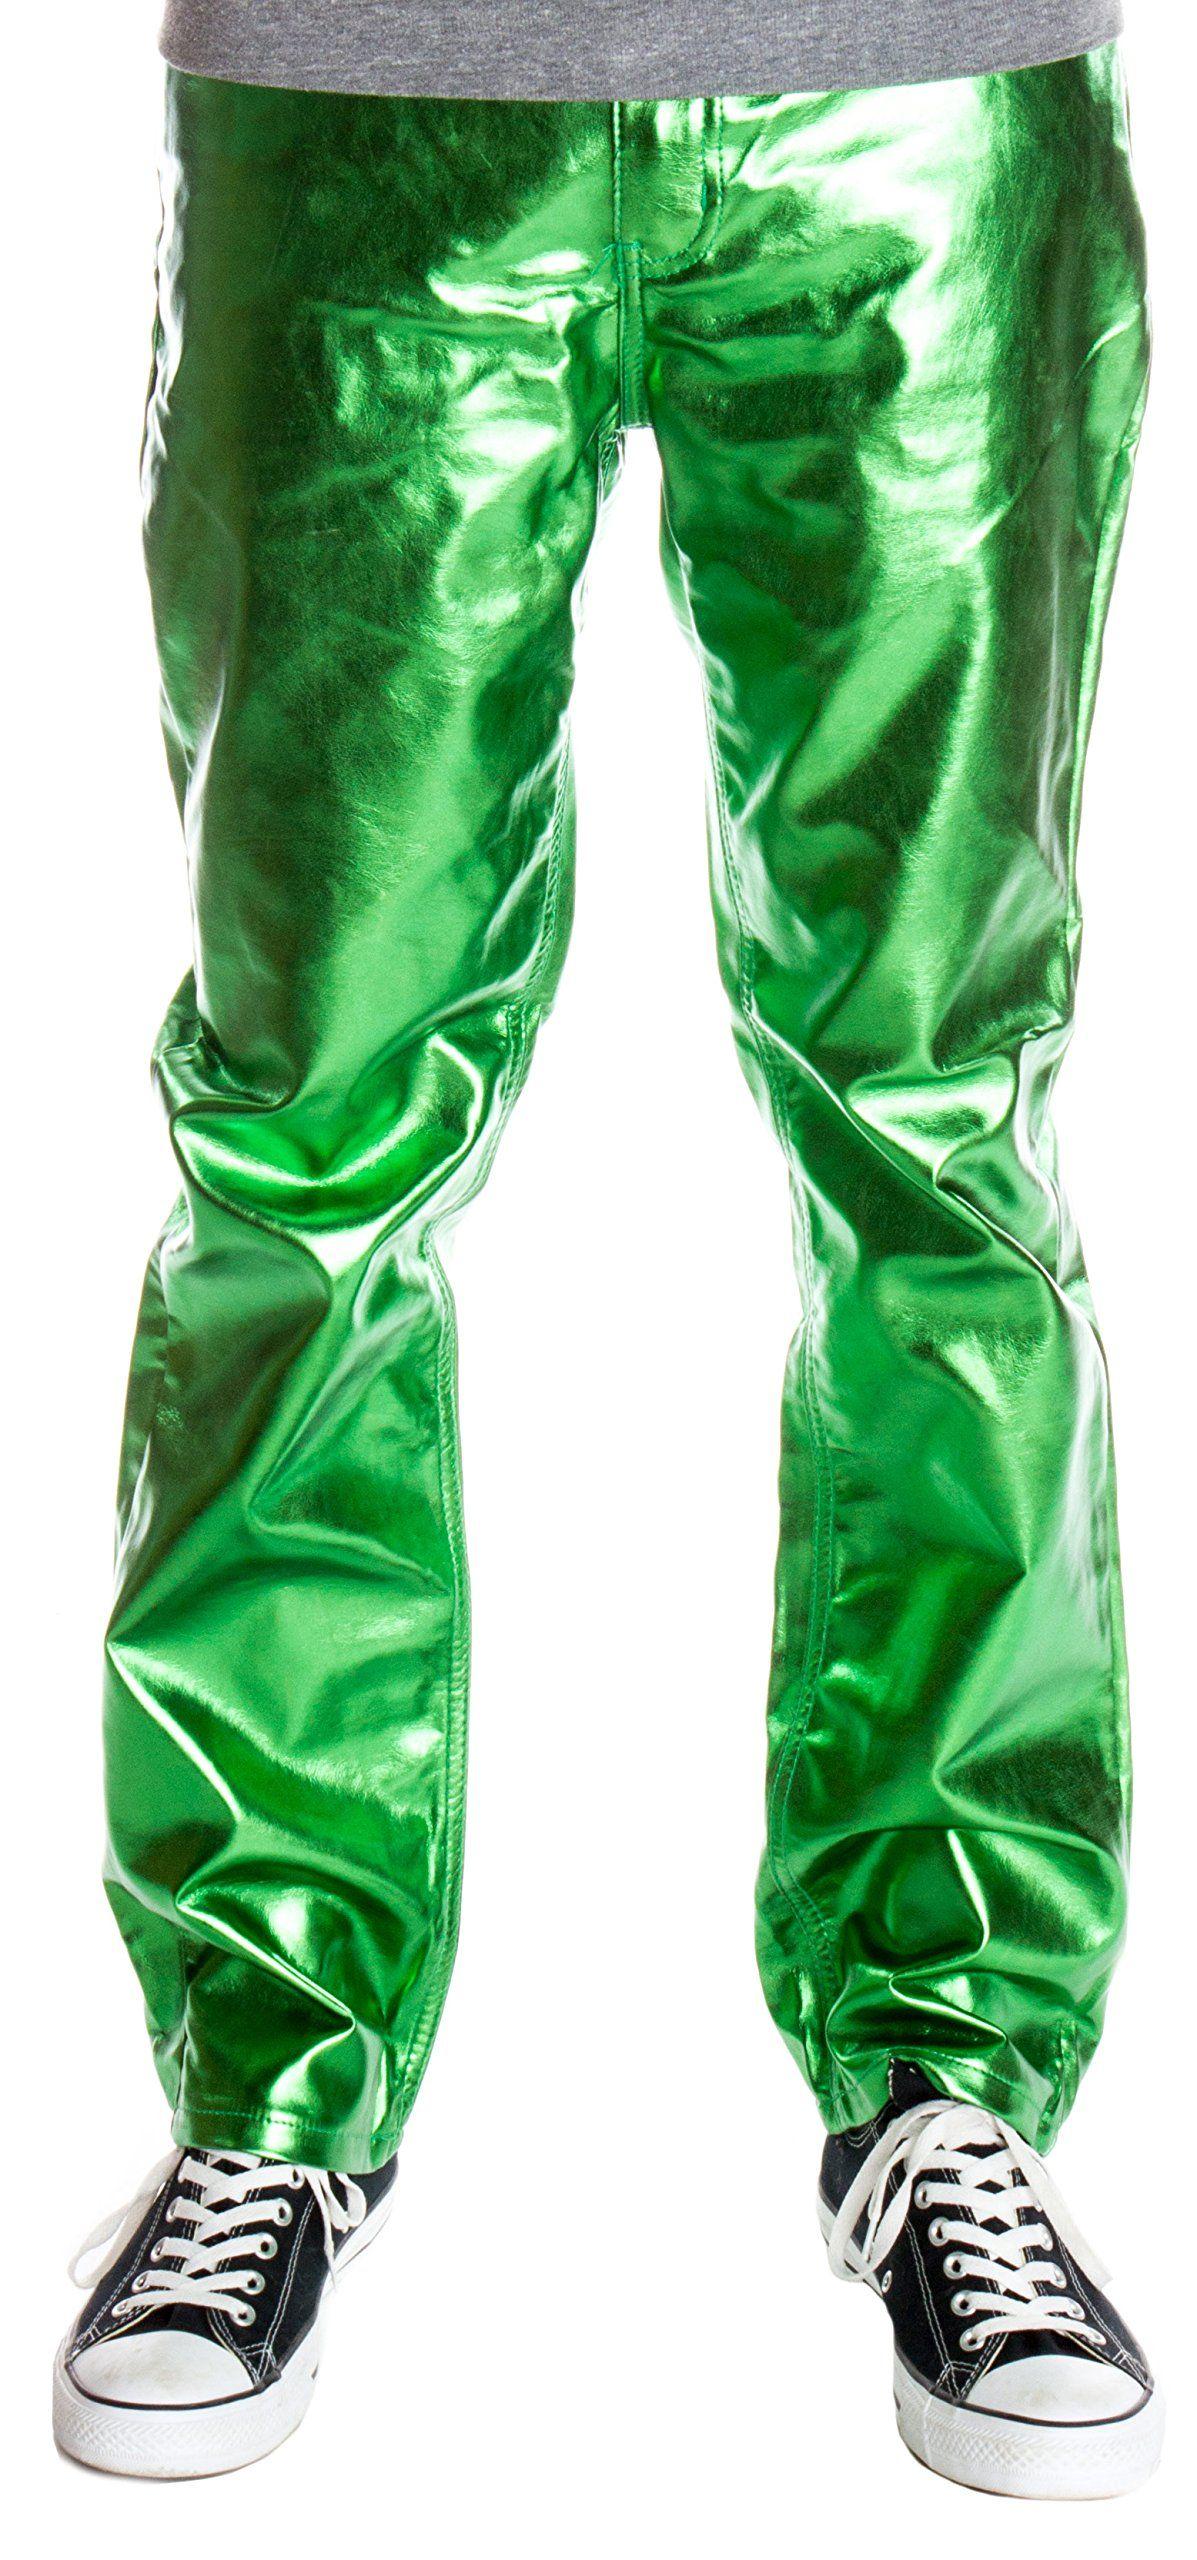 6bf284230e9 Ragstock Men s Metallic Shiny Jeans